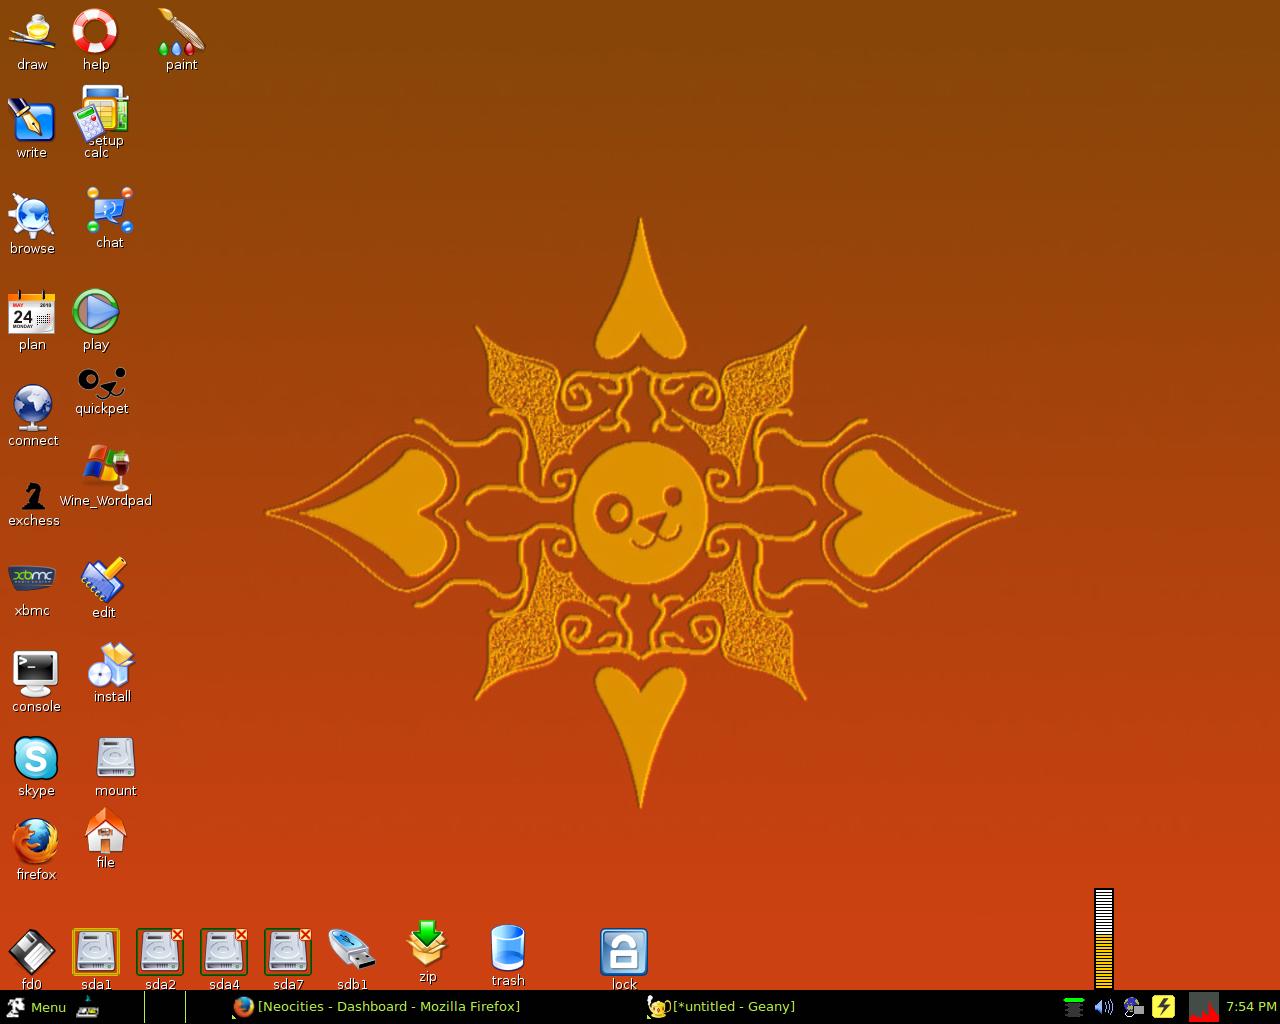 Puppy Linux 日本語版 パピーリナックス プロジェクト日本語トップページ  OSDN